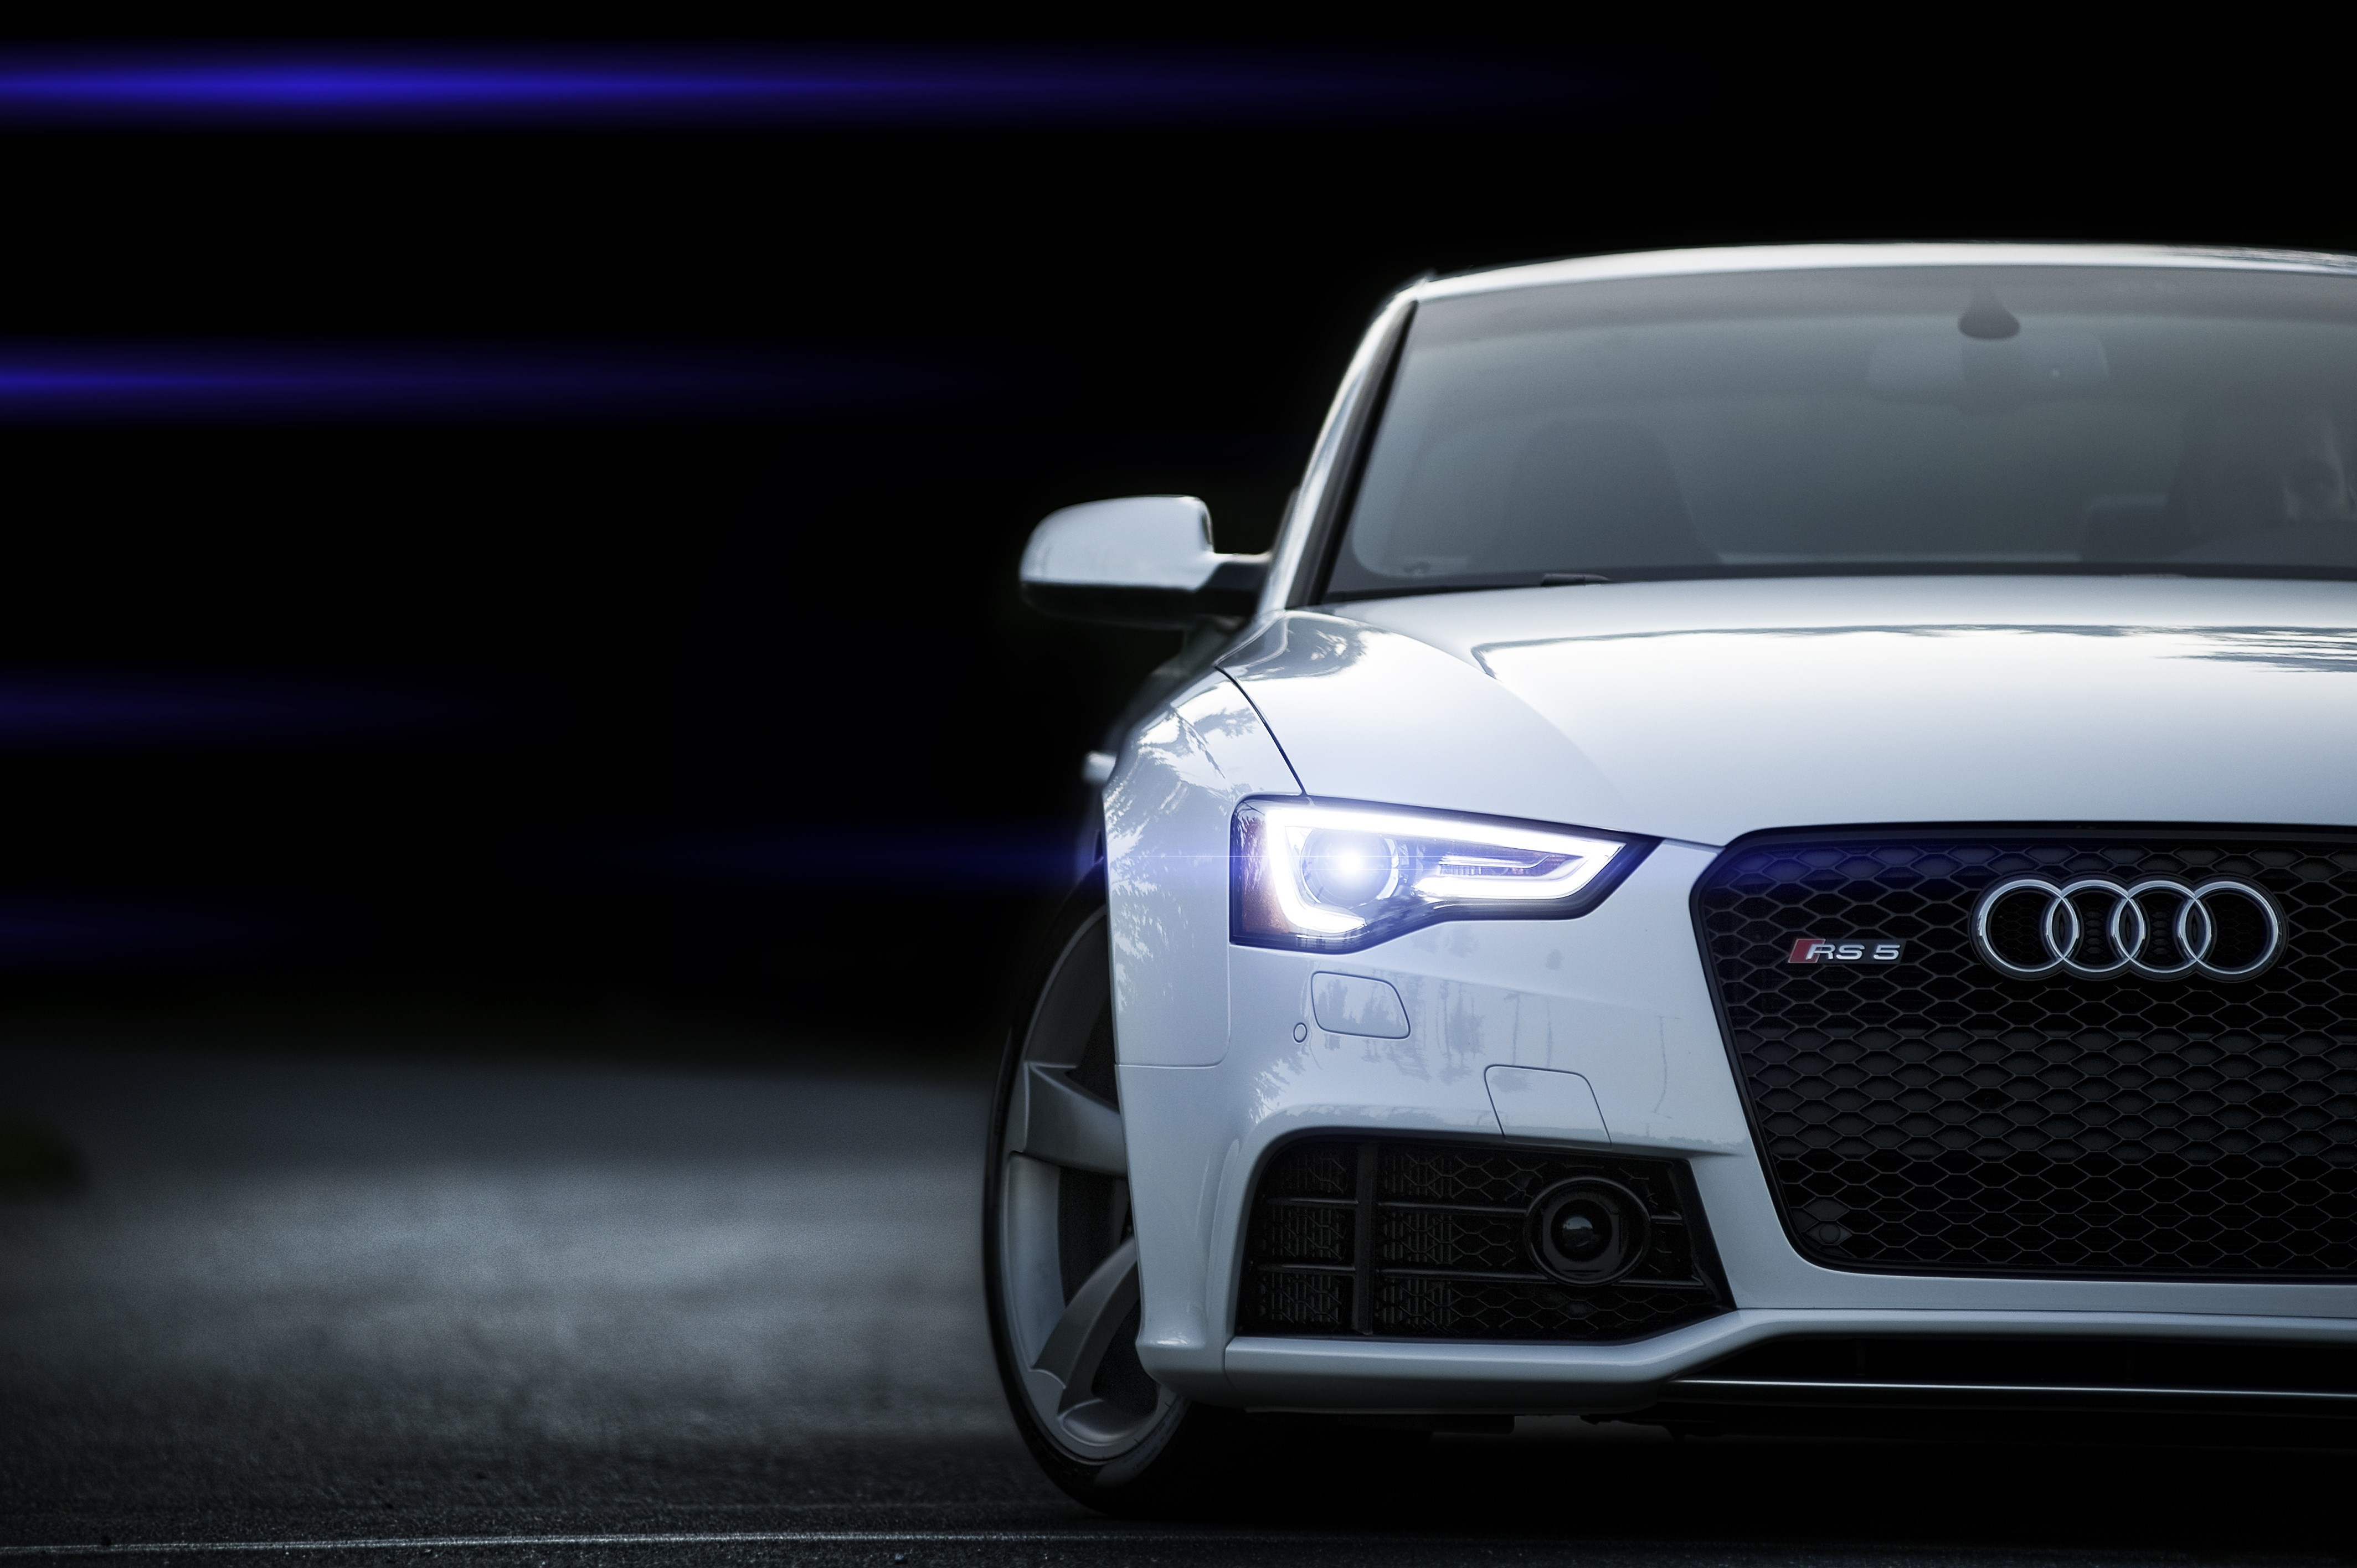 133418 Заставки и Обои Вид Спереди на телефон. Скачать Ауди (Audi), Вид Спереди, Тачки (Cars), Белый, Rs5 картинки бесплатно